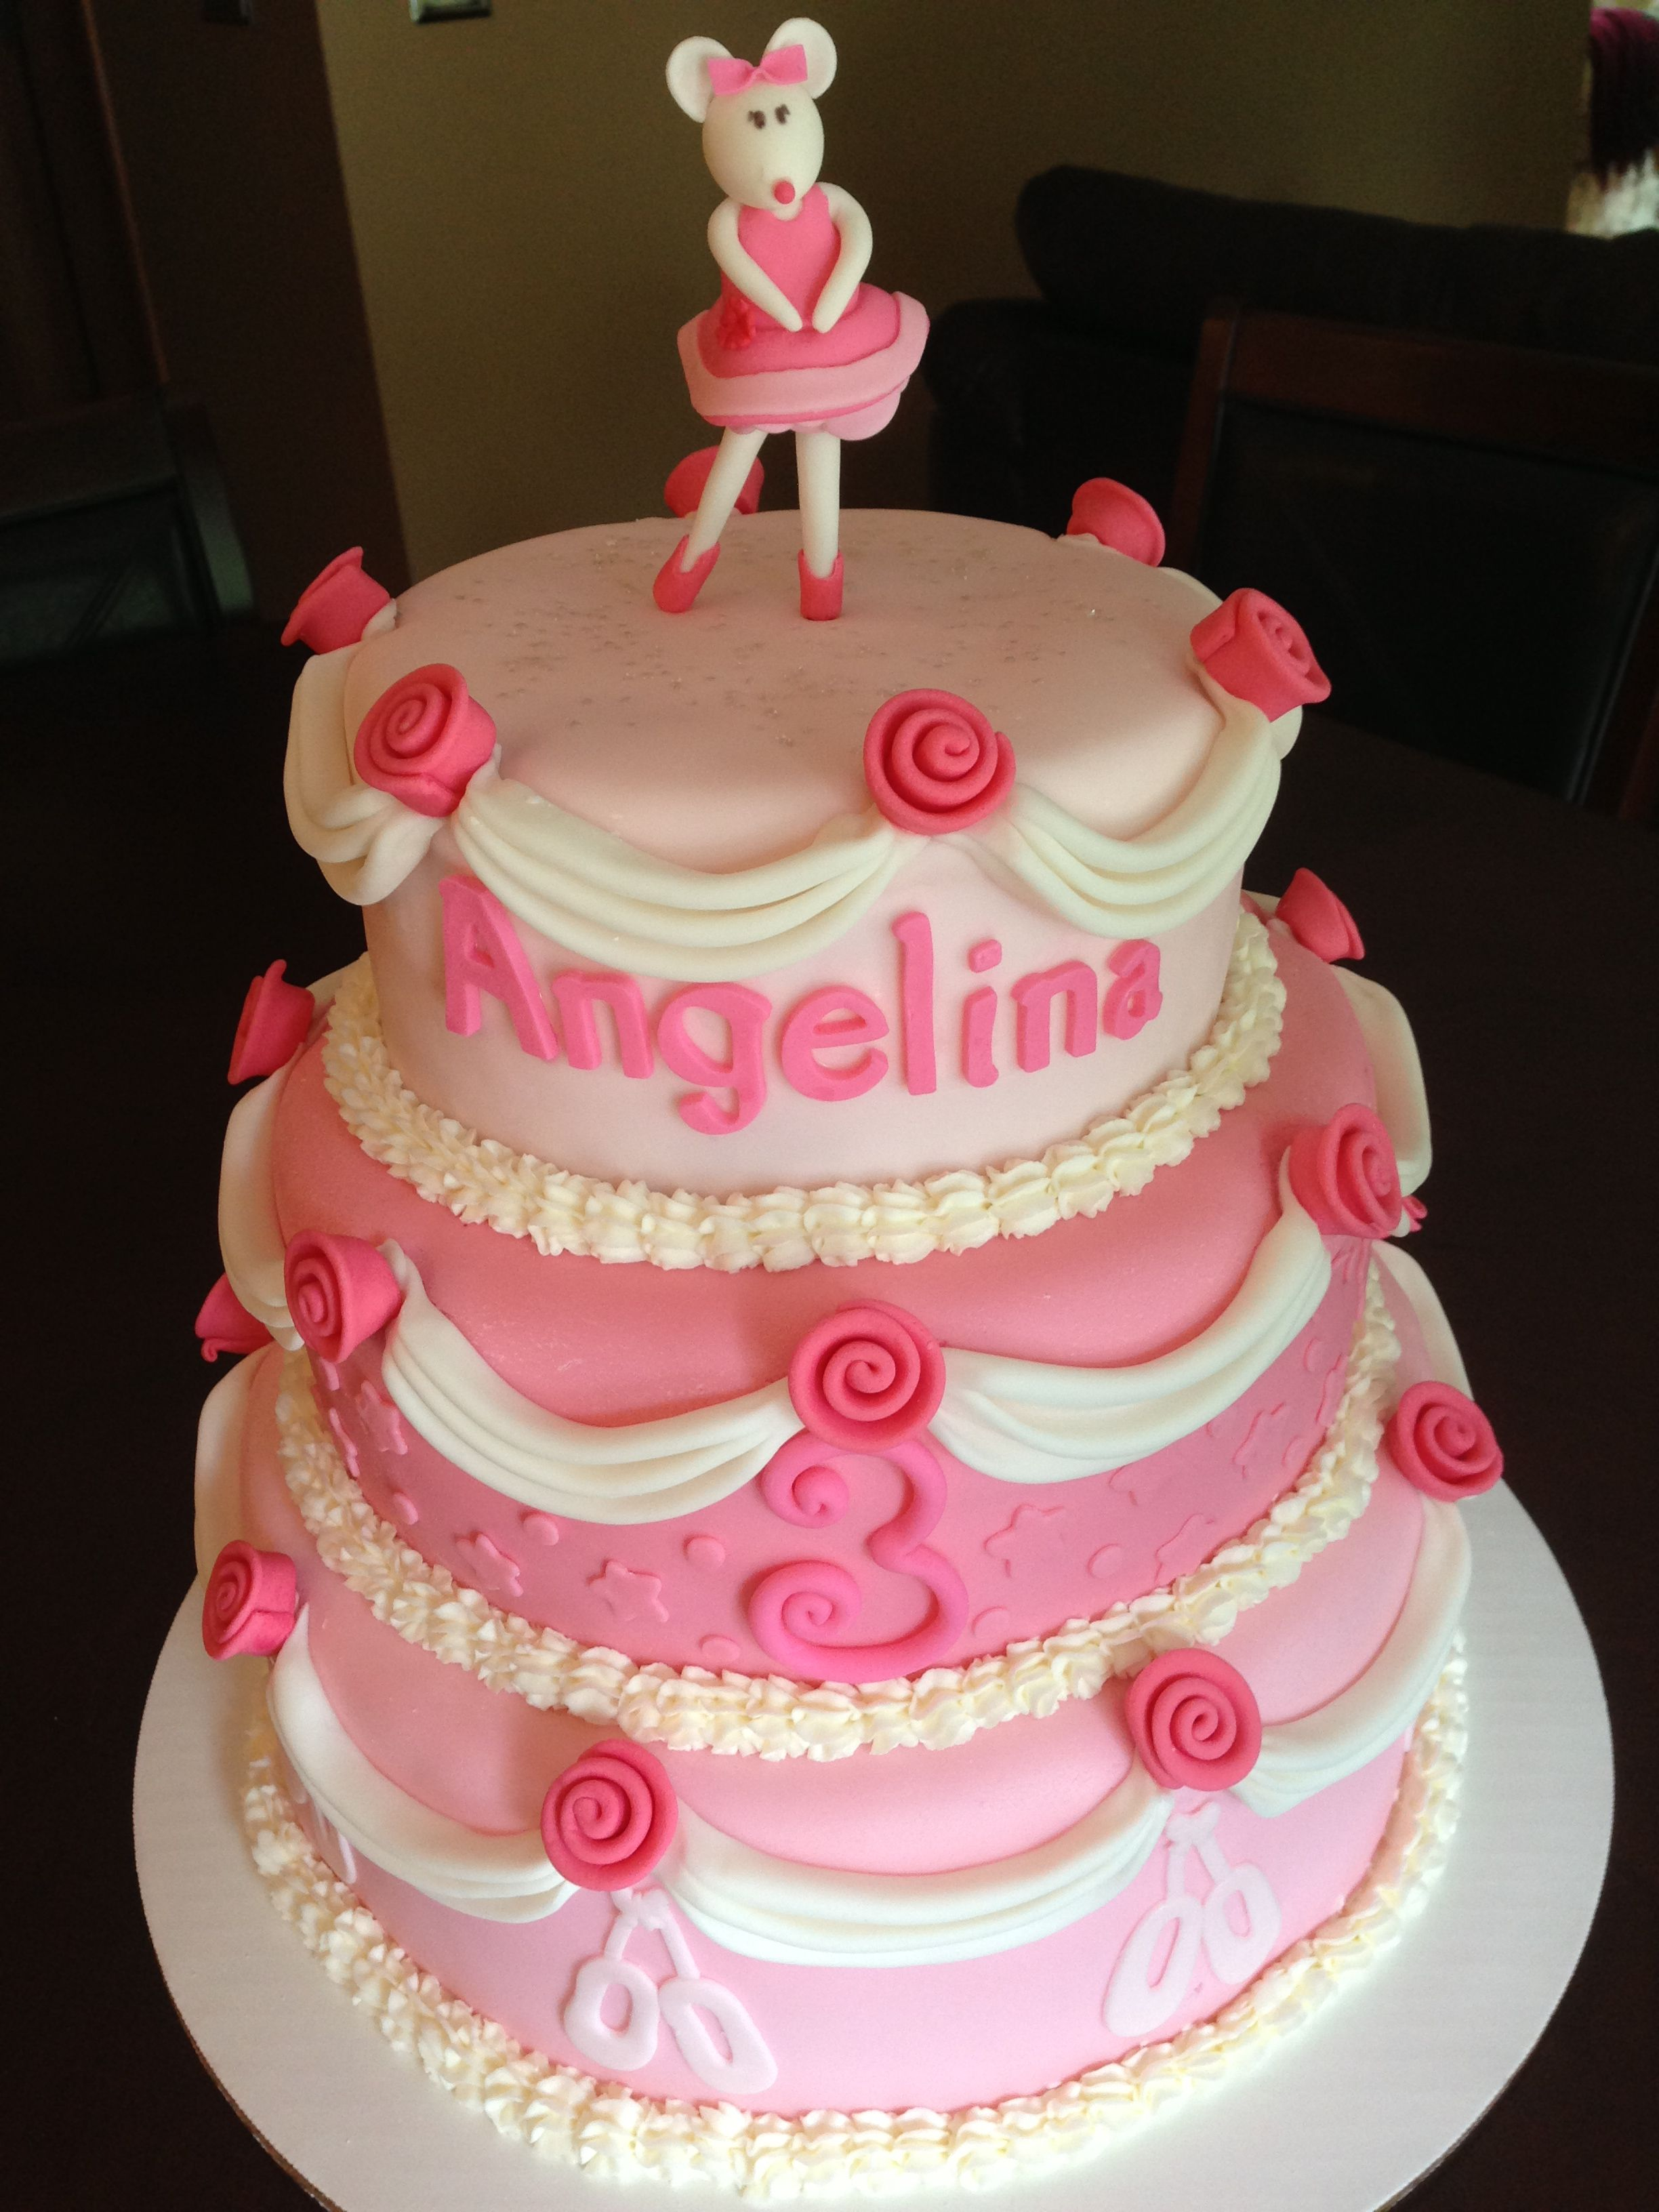 Angelina Ballerina Birthday Cake Birthday Cakes Pinterest